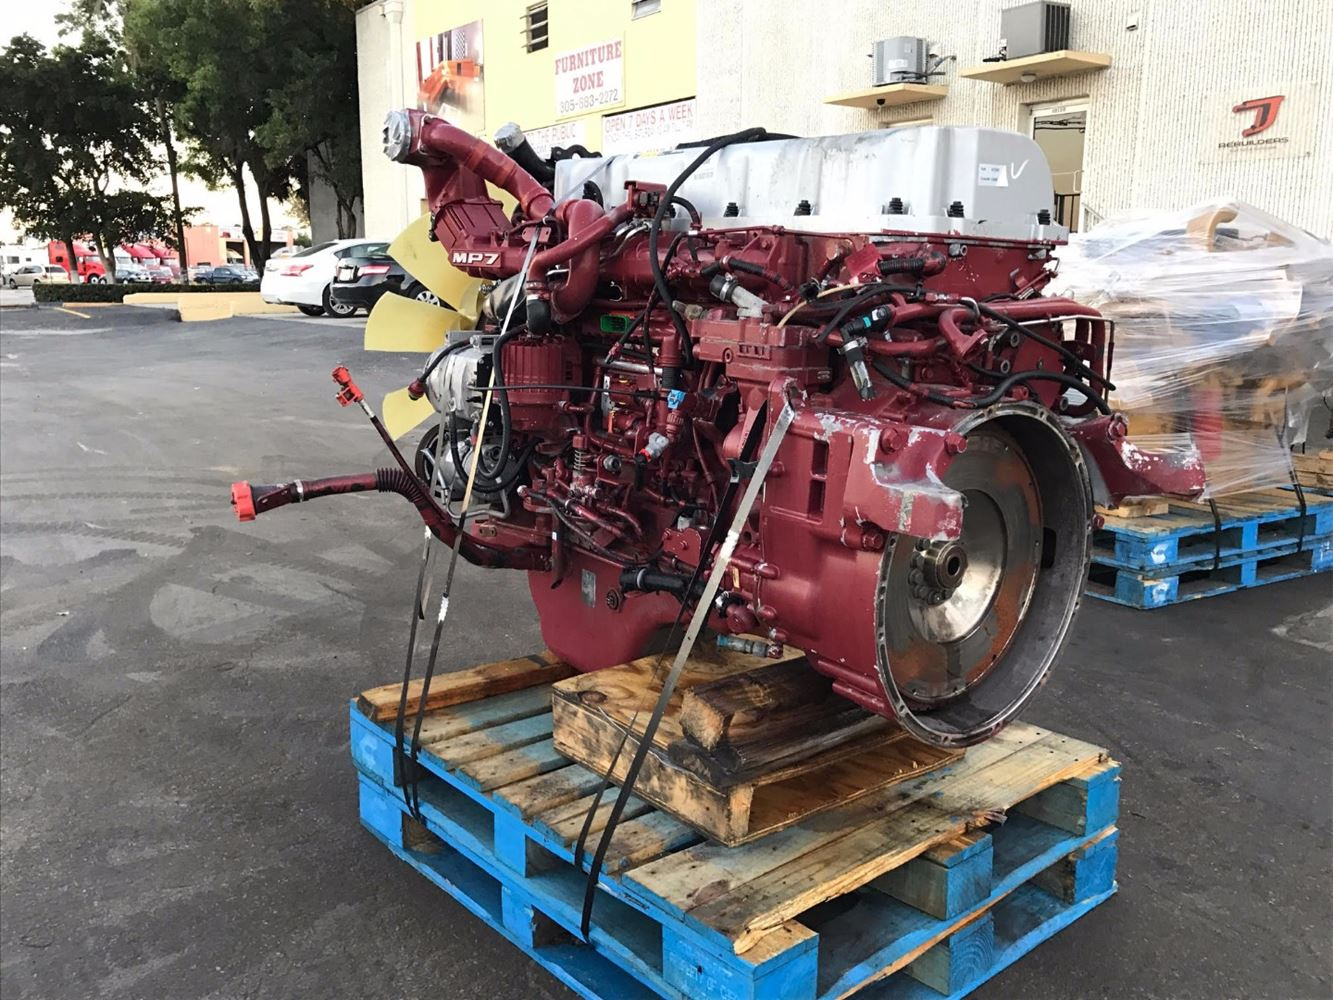 2011-Mack-MP7-Engine-ys-iFXYyBkXbXfb_f Mack Truck Engine Wiring Harness on cap third brake light, international semi, for 5600 international,